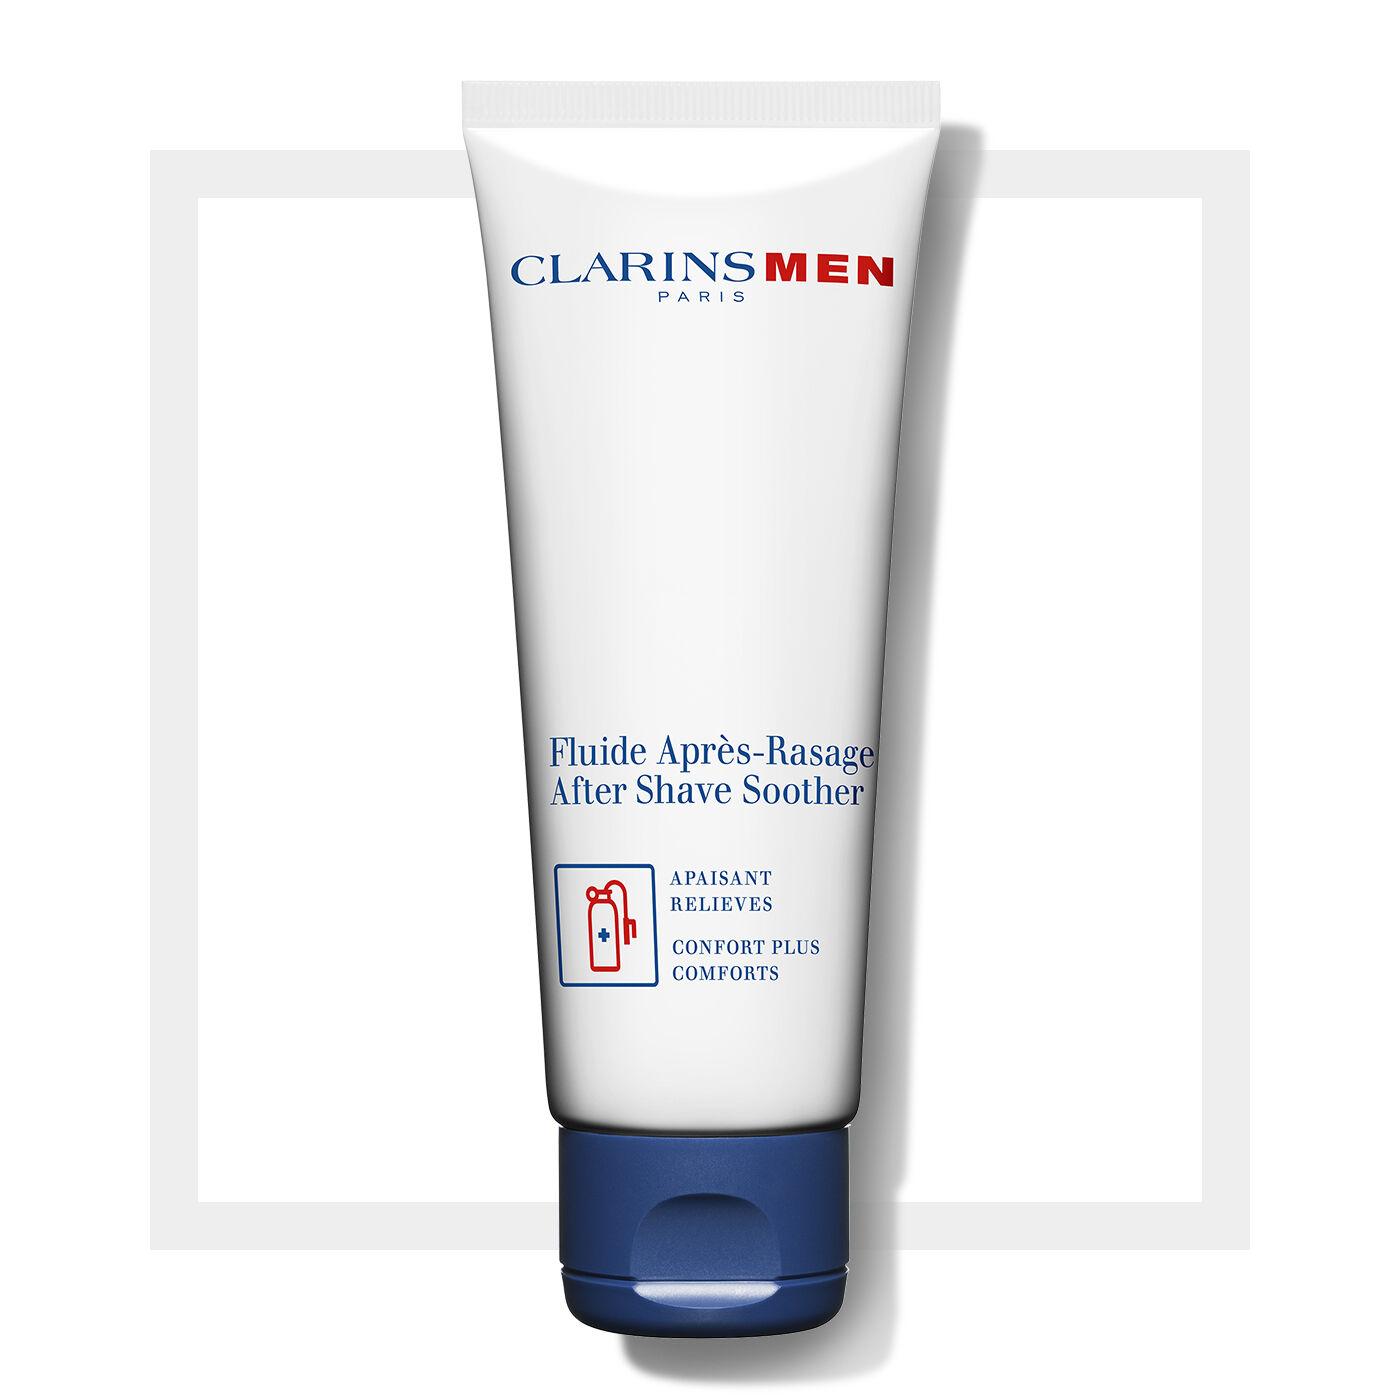 After-Shave%20Fluide%20Apr%C3%A8s%20Rasage%20ClarinsMen